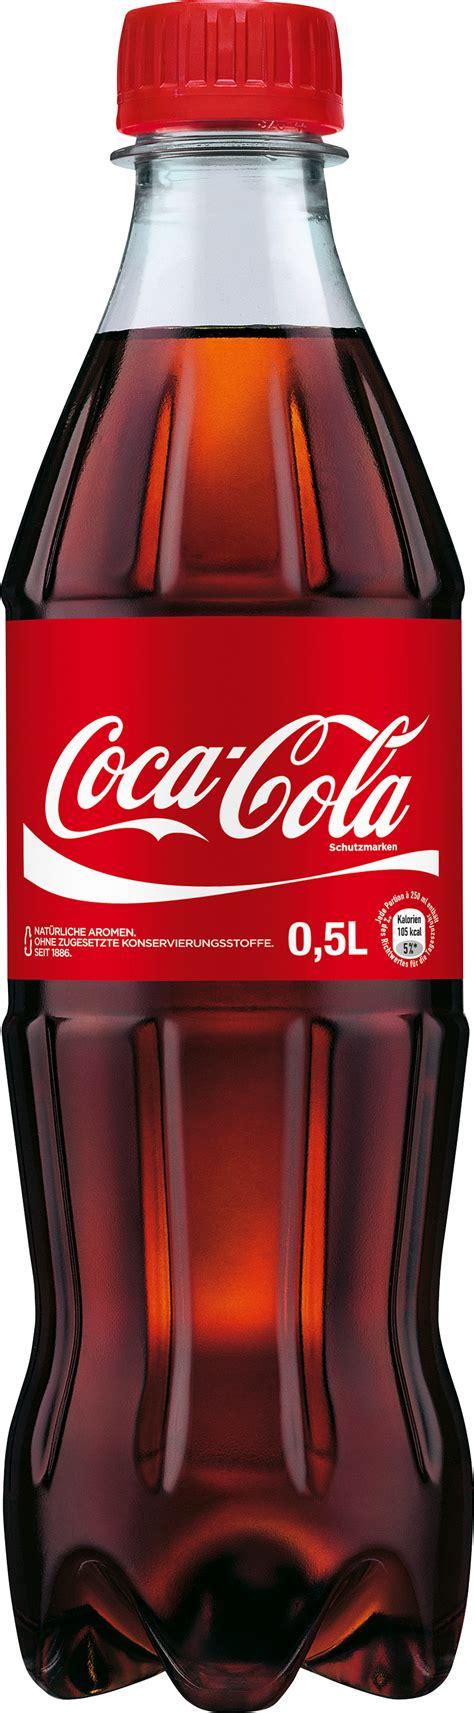 coca cola flasche pet   einweg png   icons